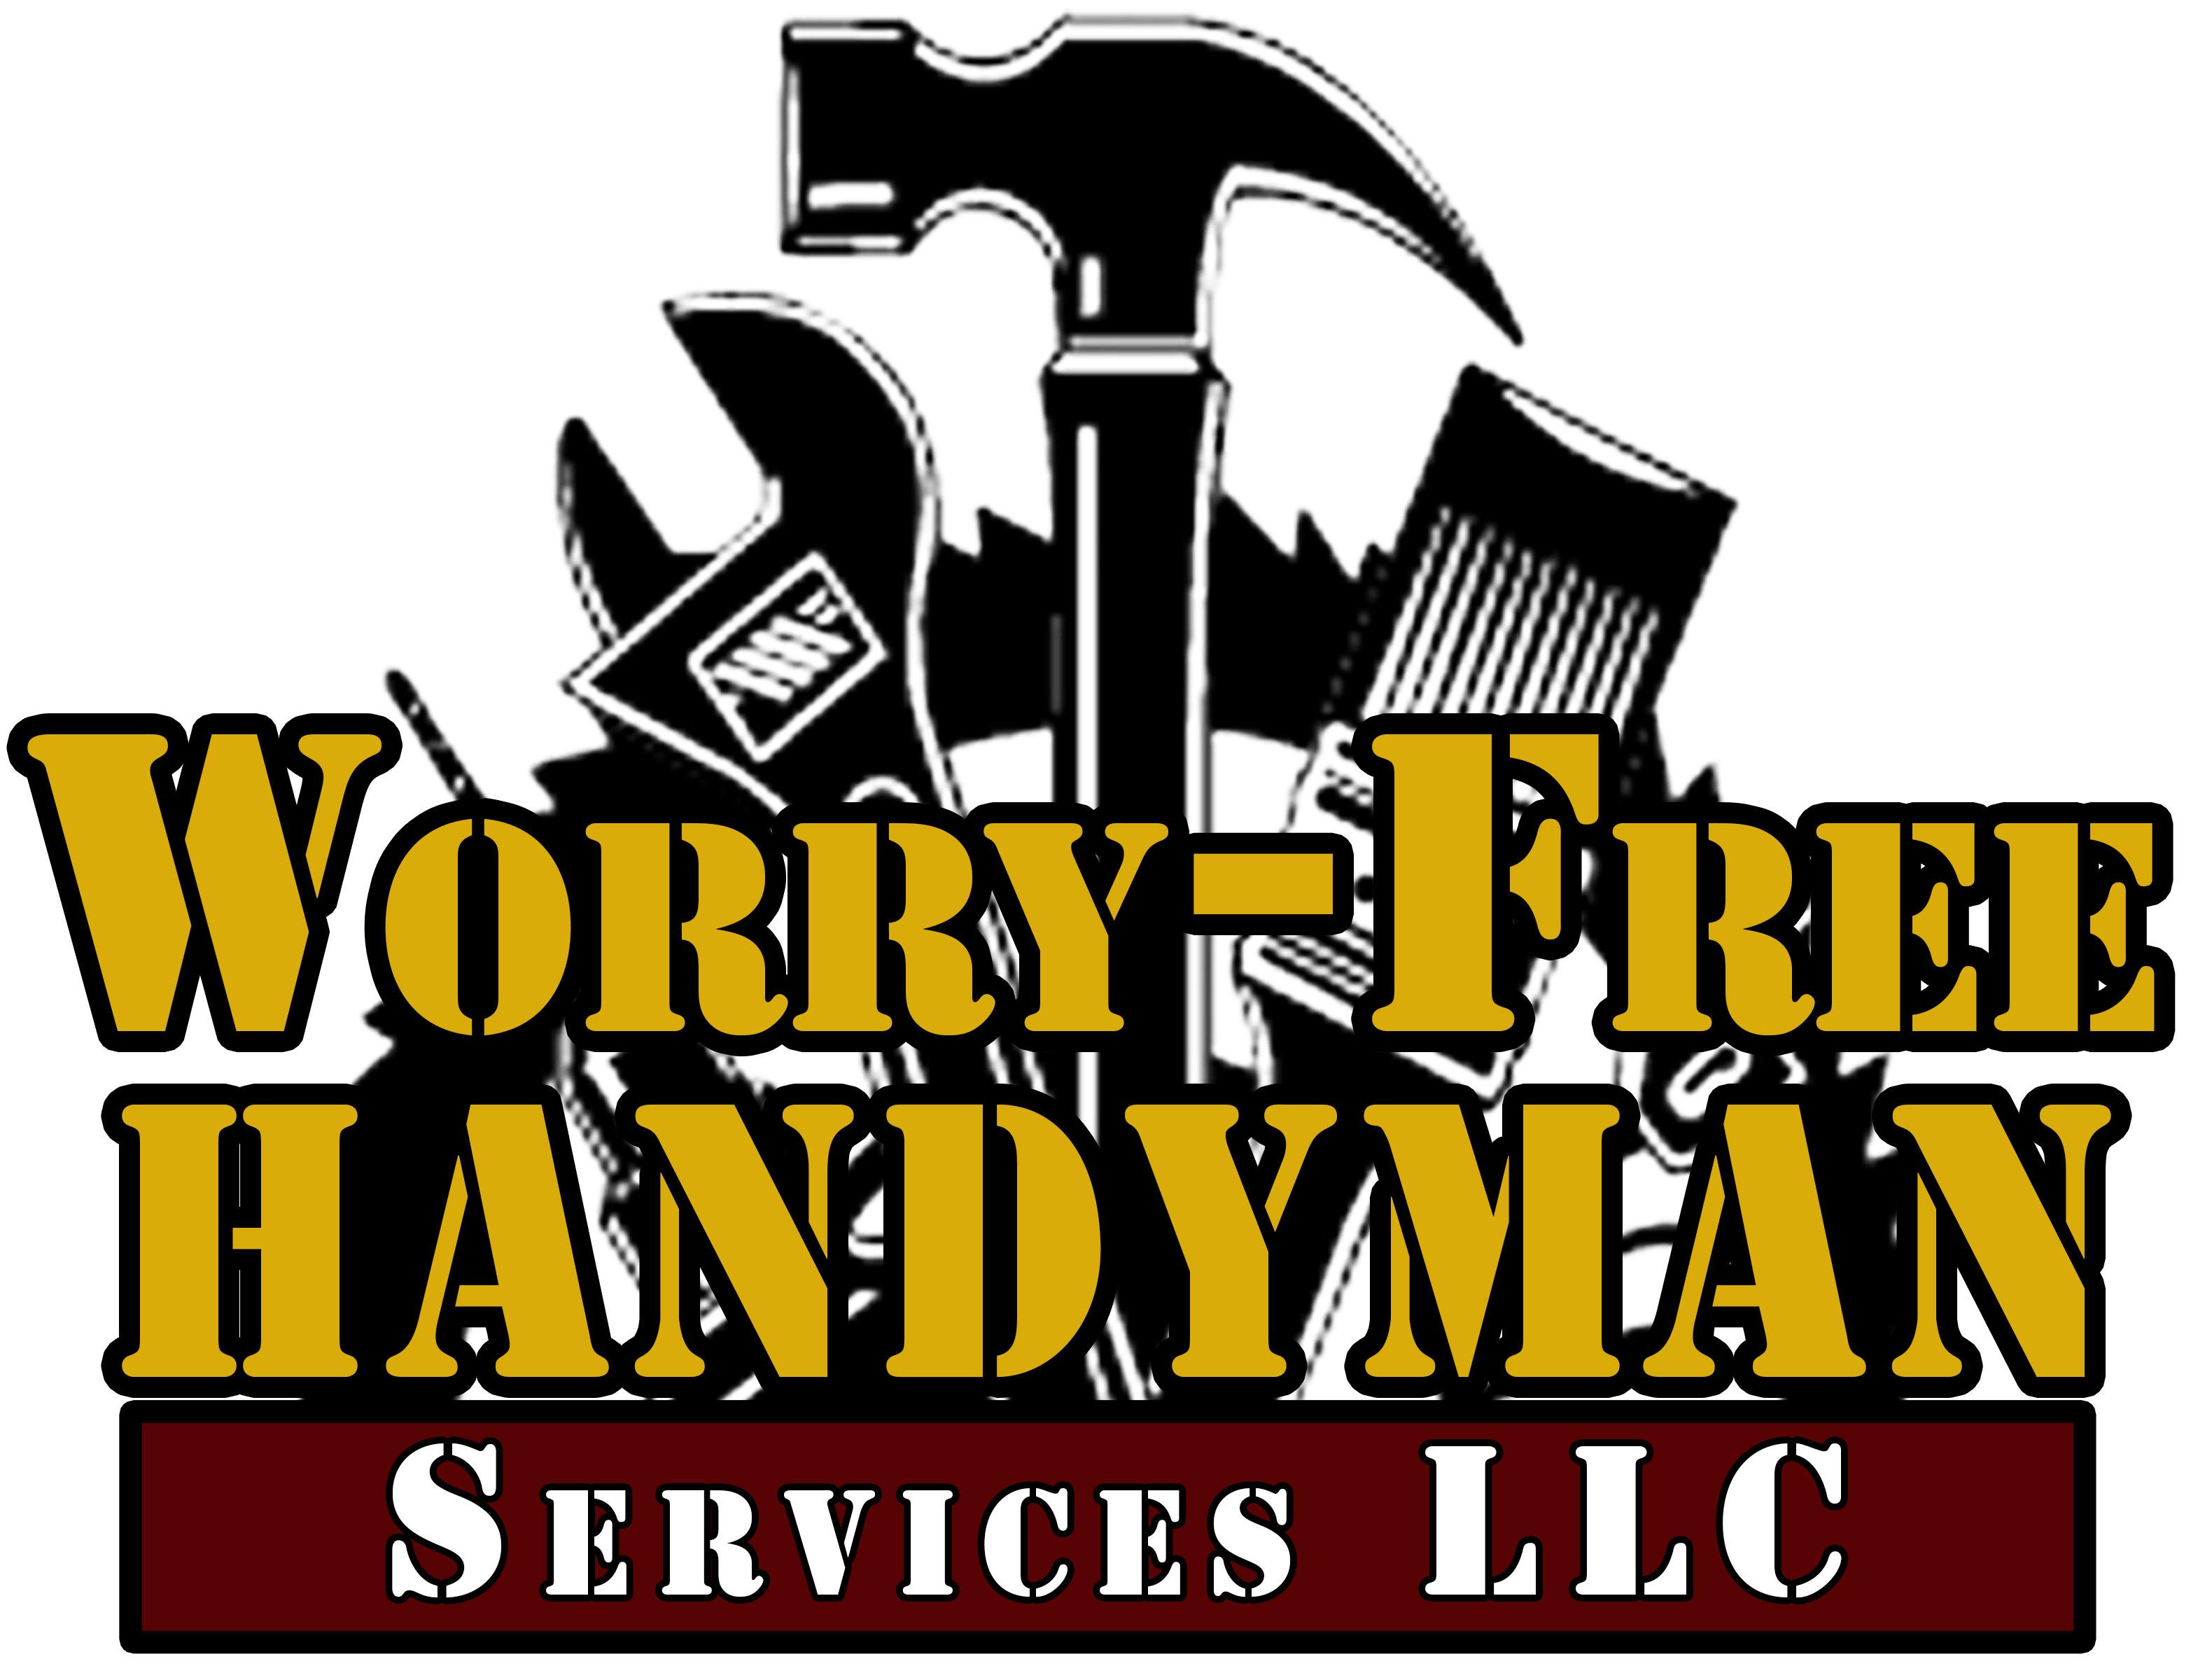 Free Free Handyman Logos, Download Free Clip Art, Free Clip Art on.